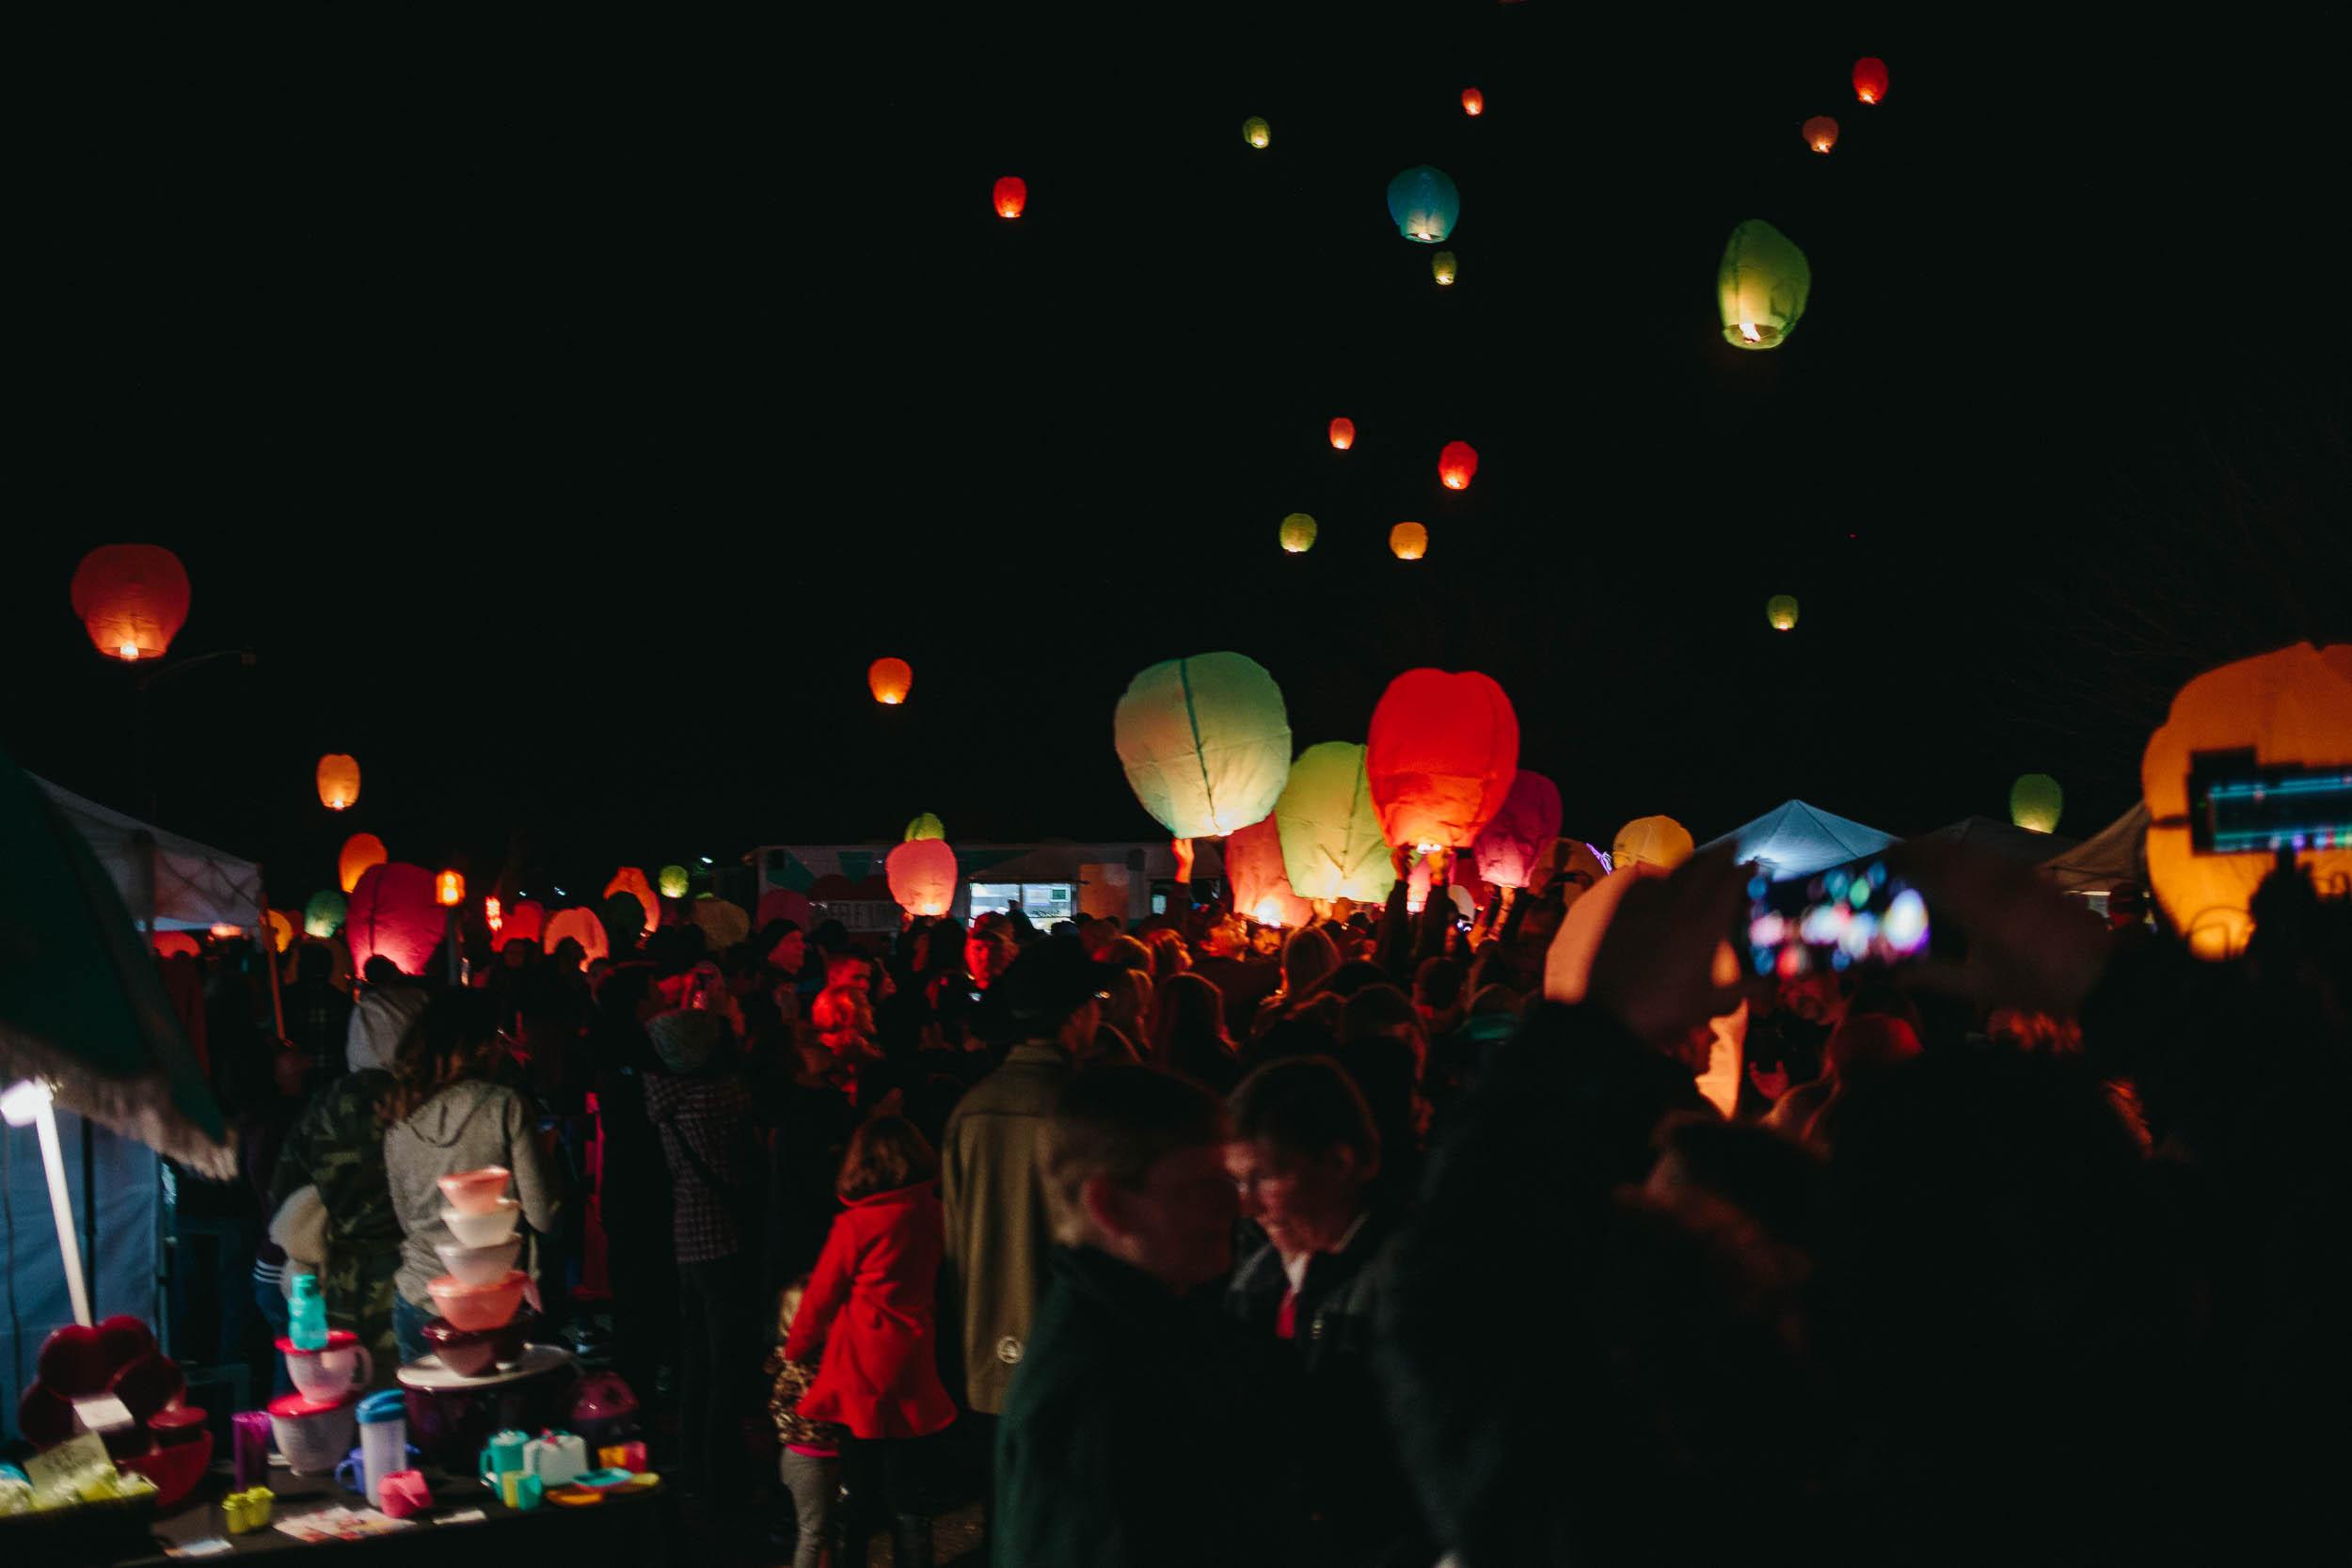 Kyle-Sheppard-Kanab-Balloon-Festival-60.jpg